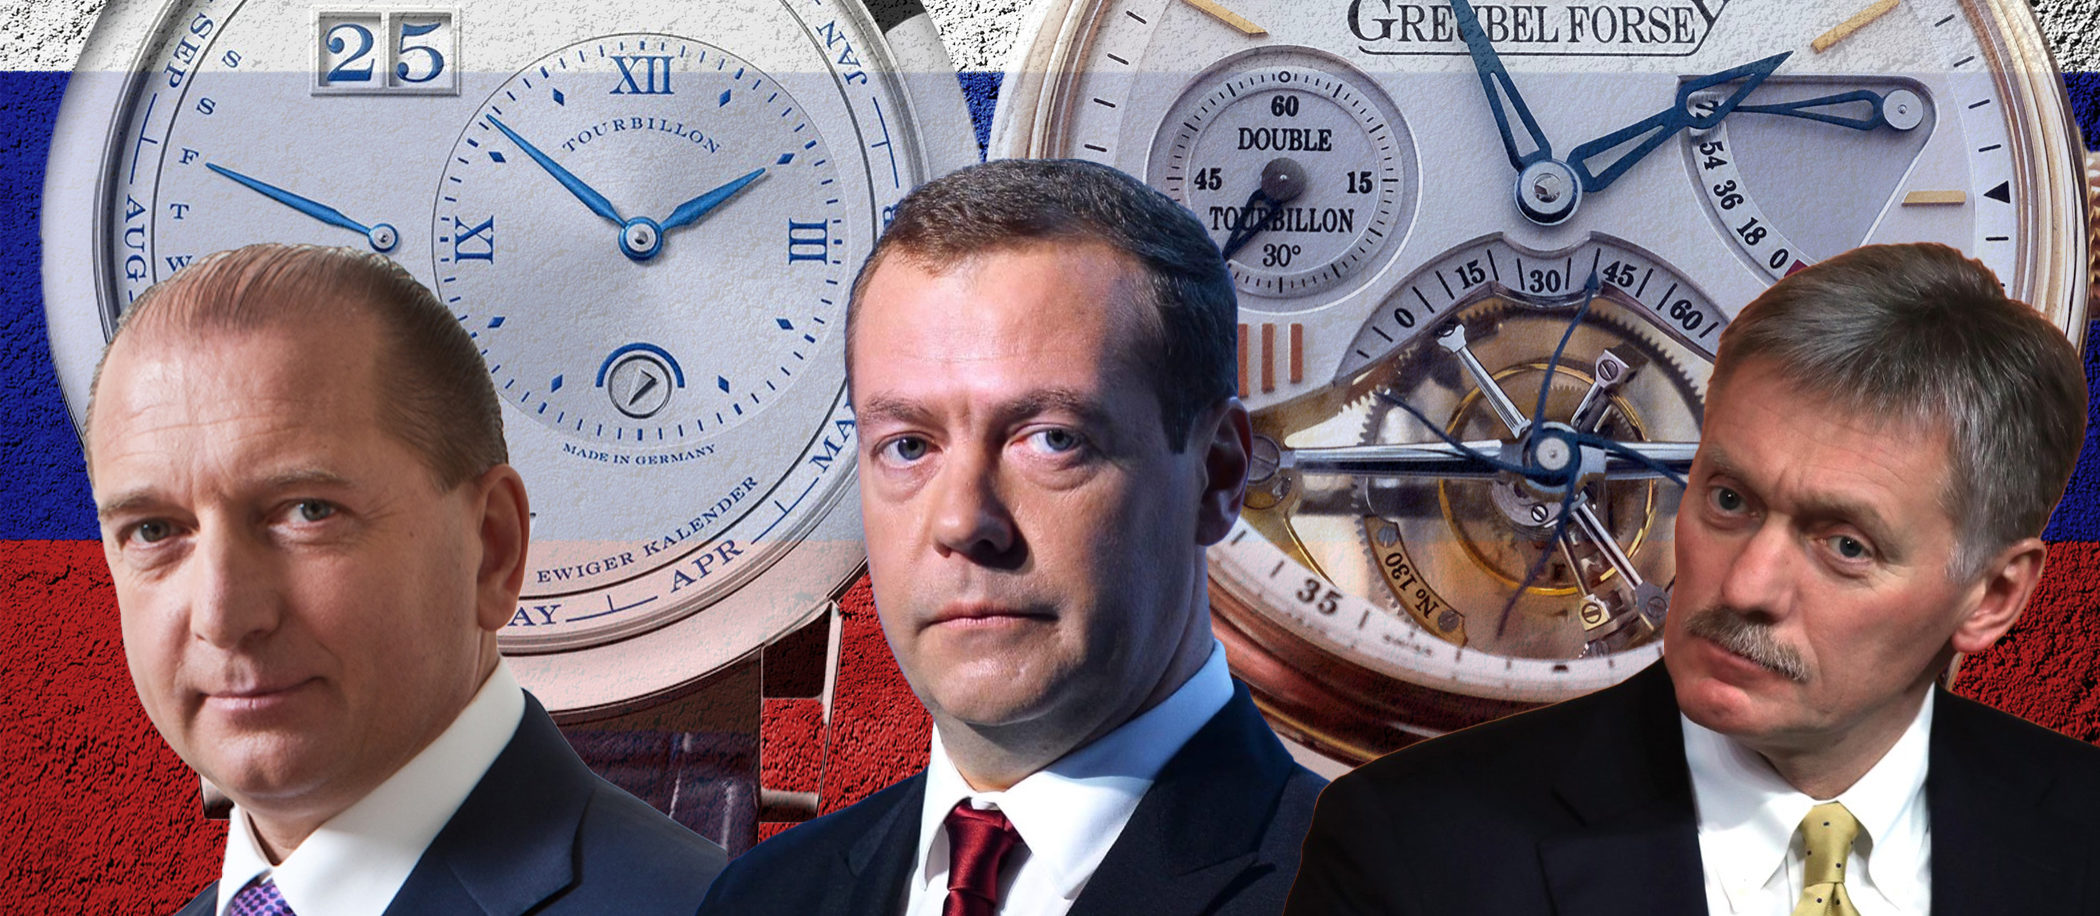 Foto: rostec.ru / facebook.com/dmitry.medvedev / kremlin.ru